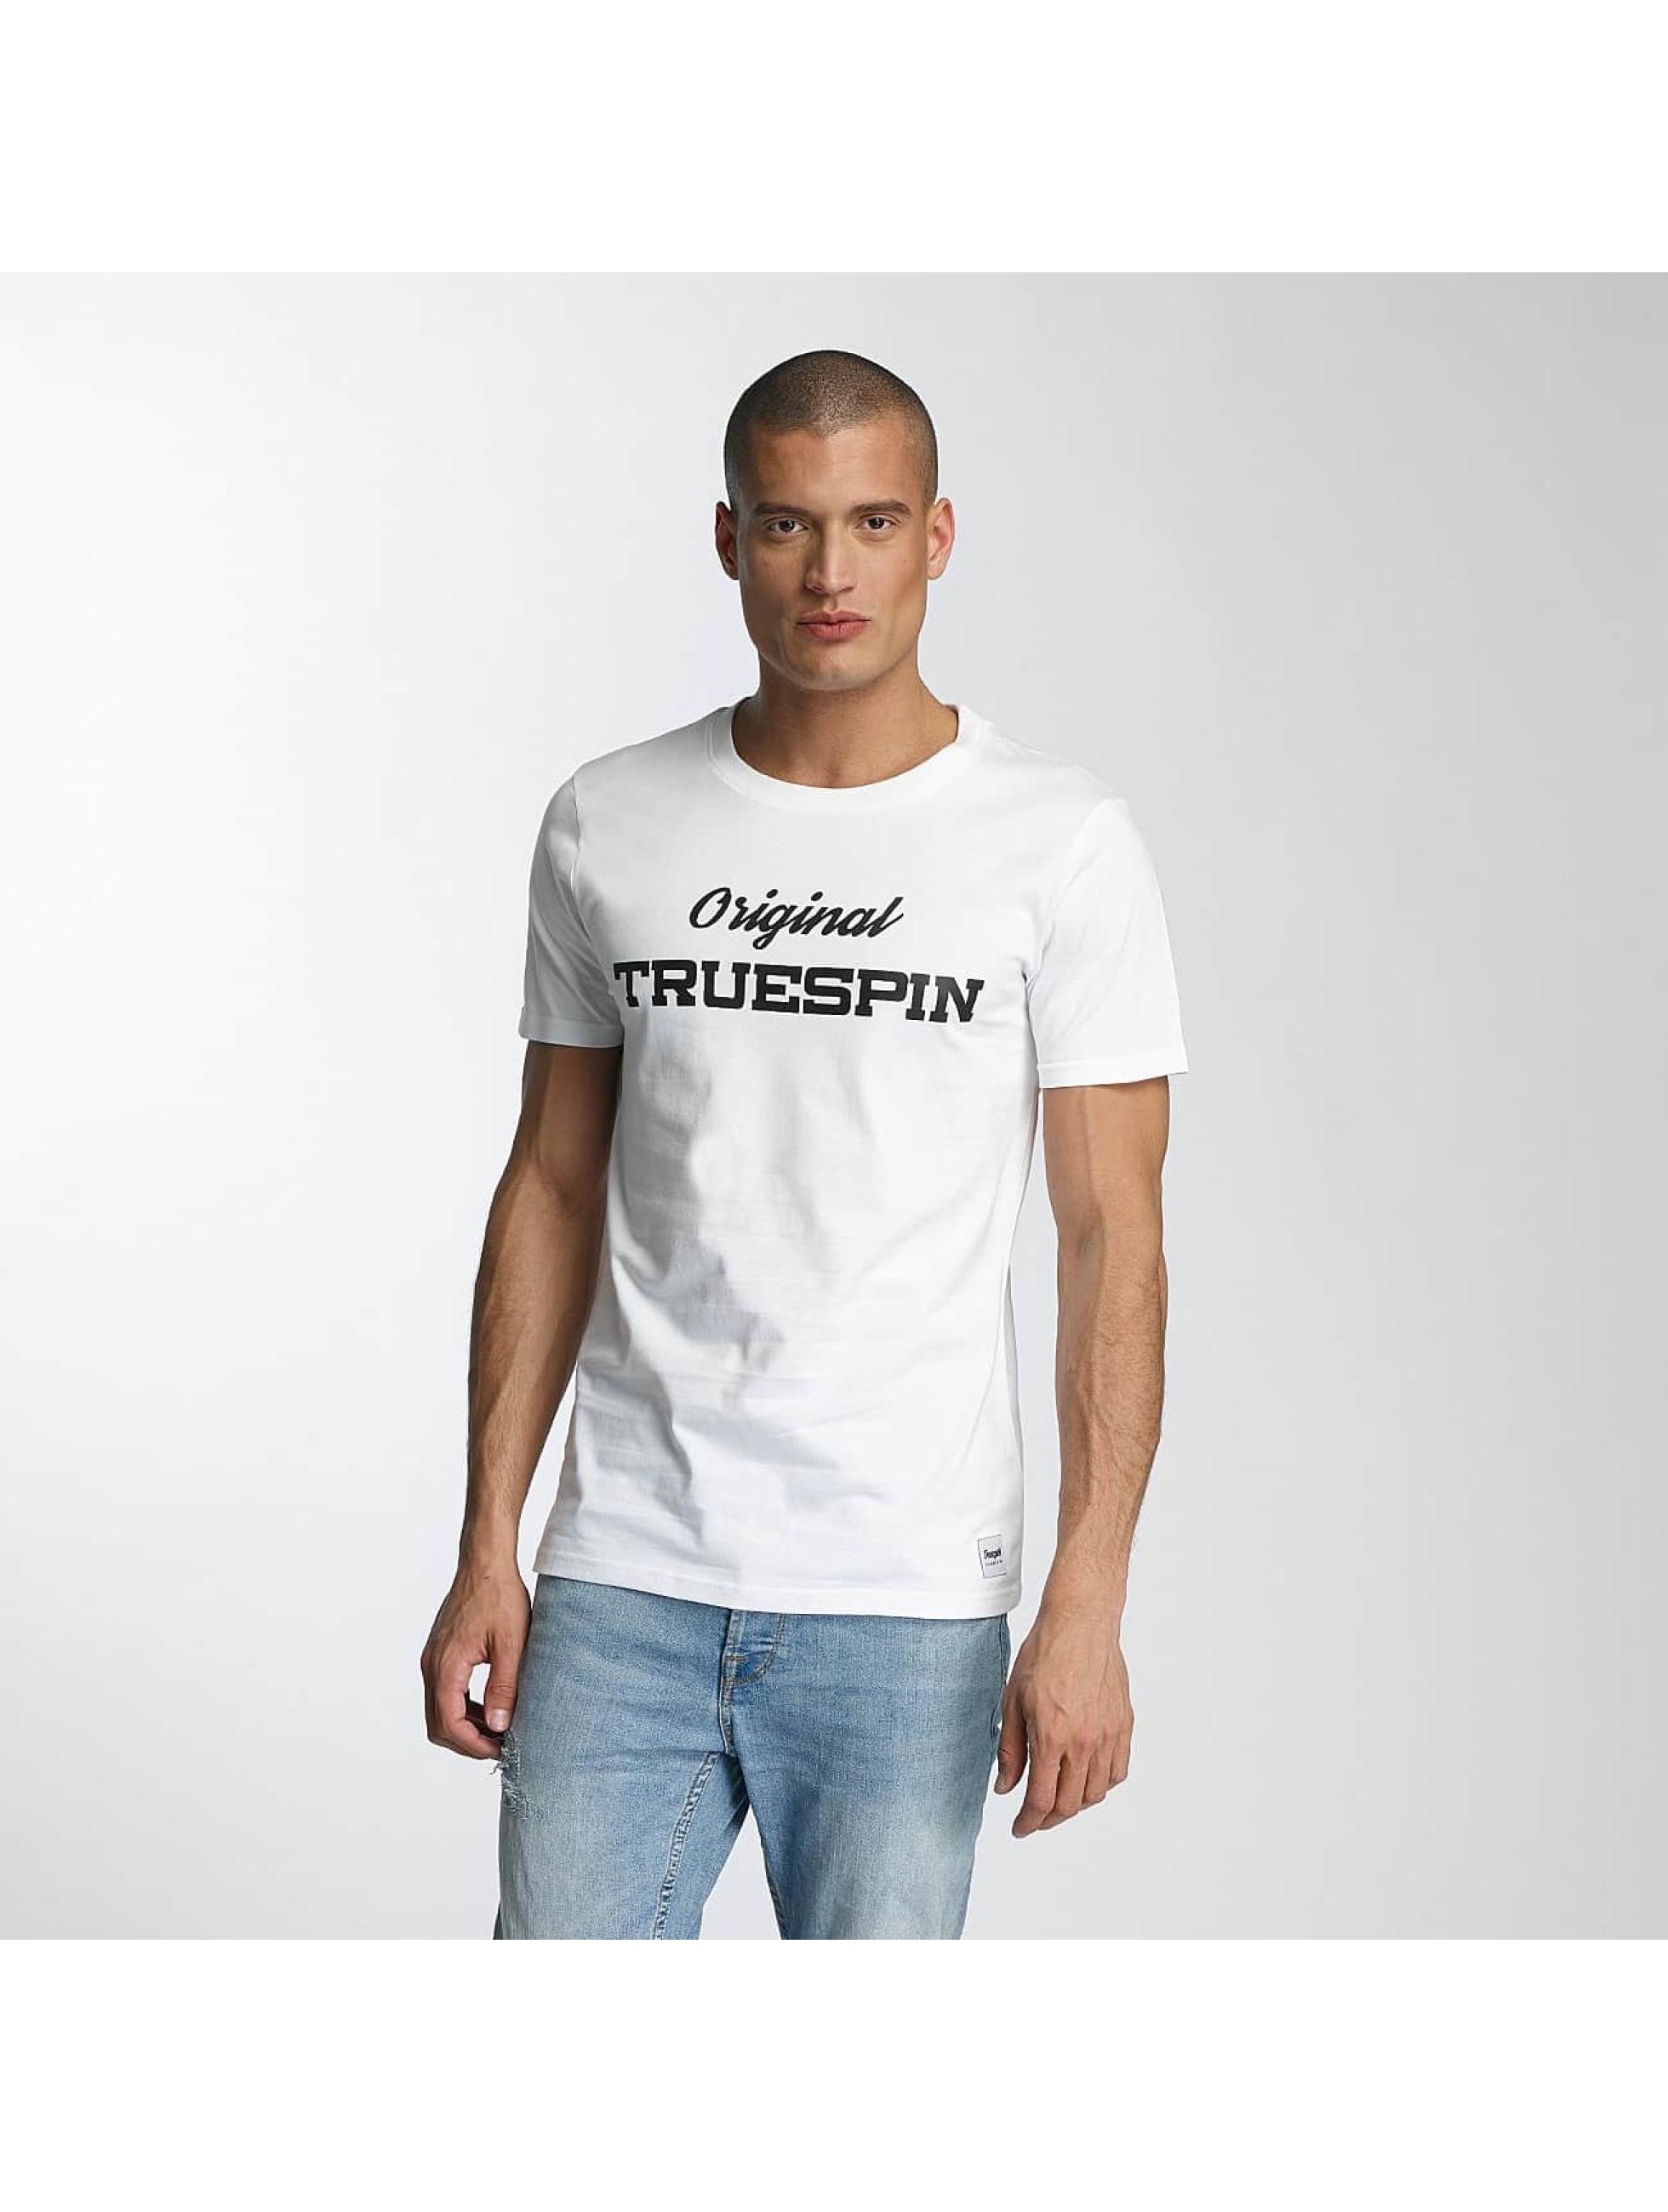 TrueSpin Männer T-Shirt 3 in weiß